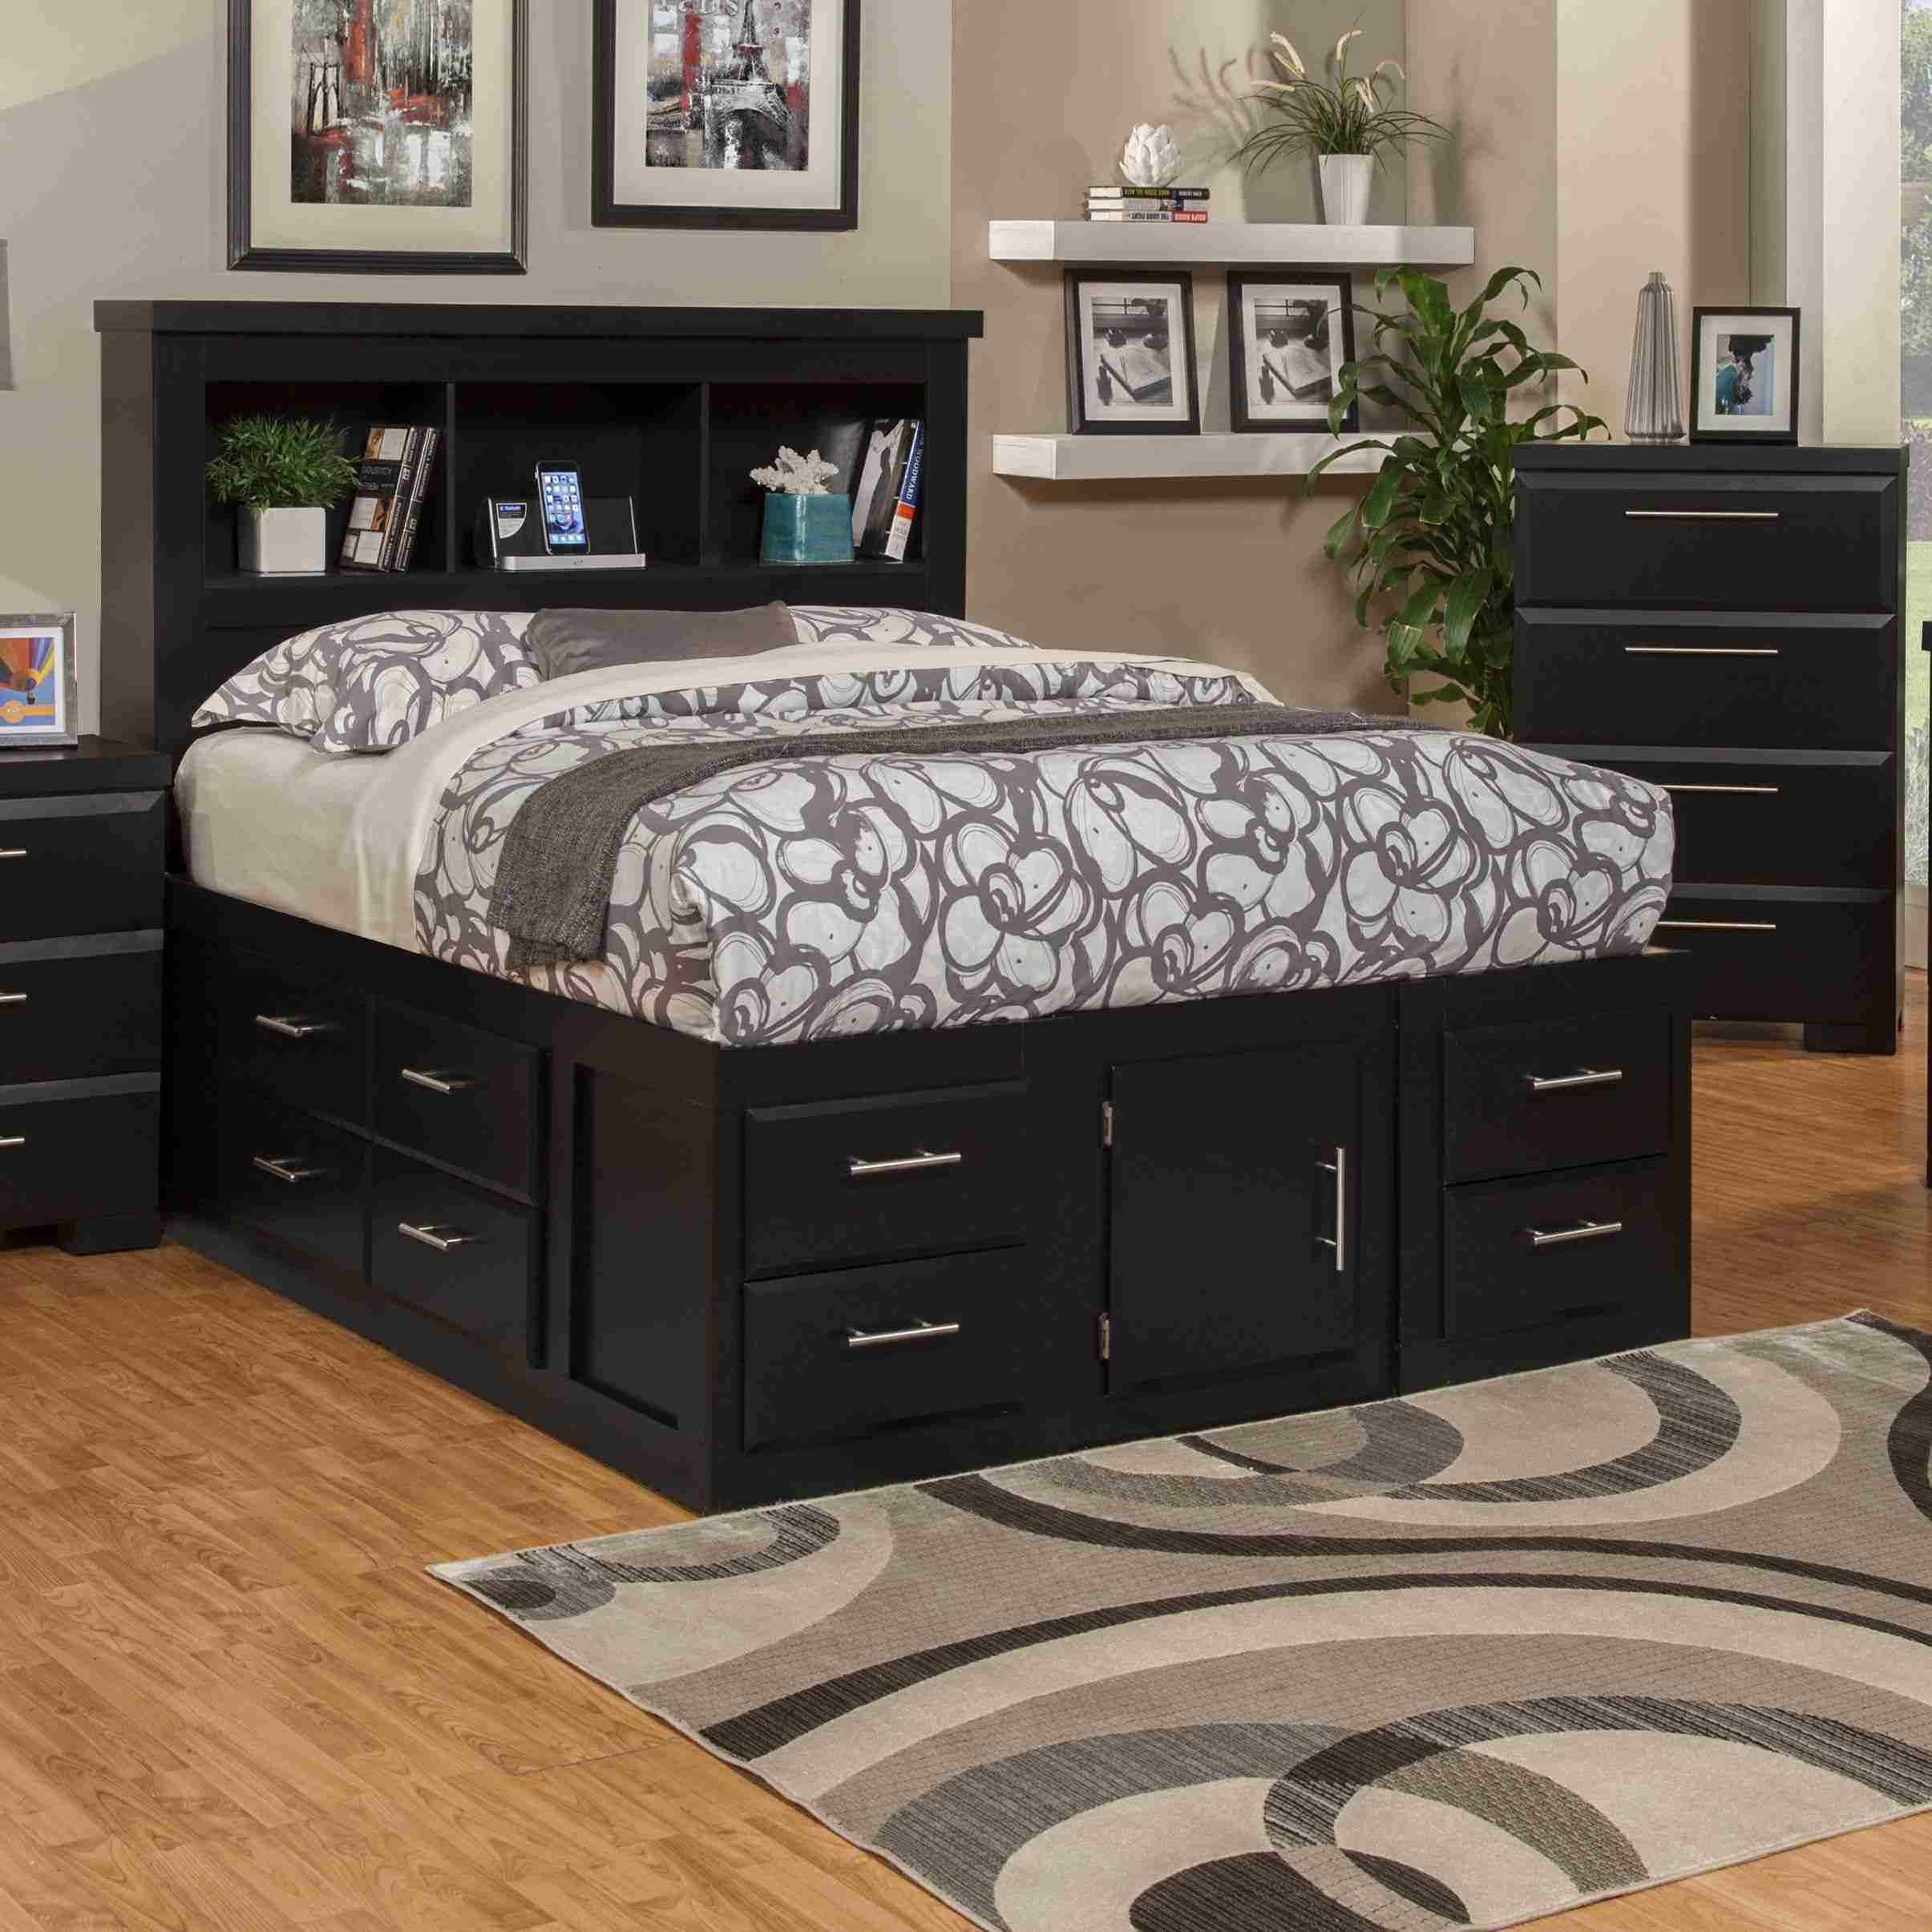 Platform Storage Bedroom Sets in 8  Bed with drawers, Wayfair